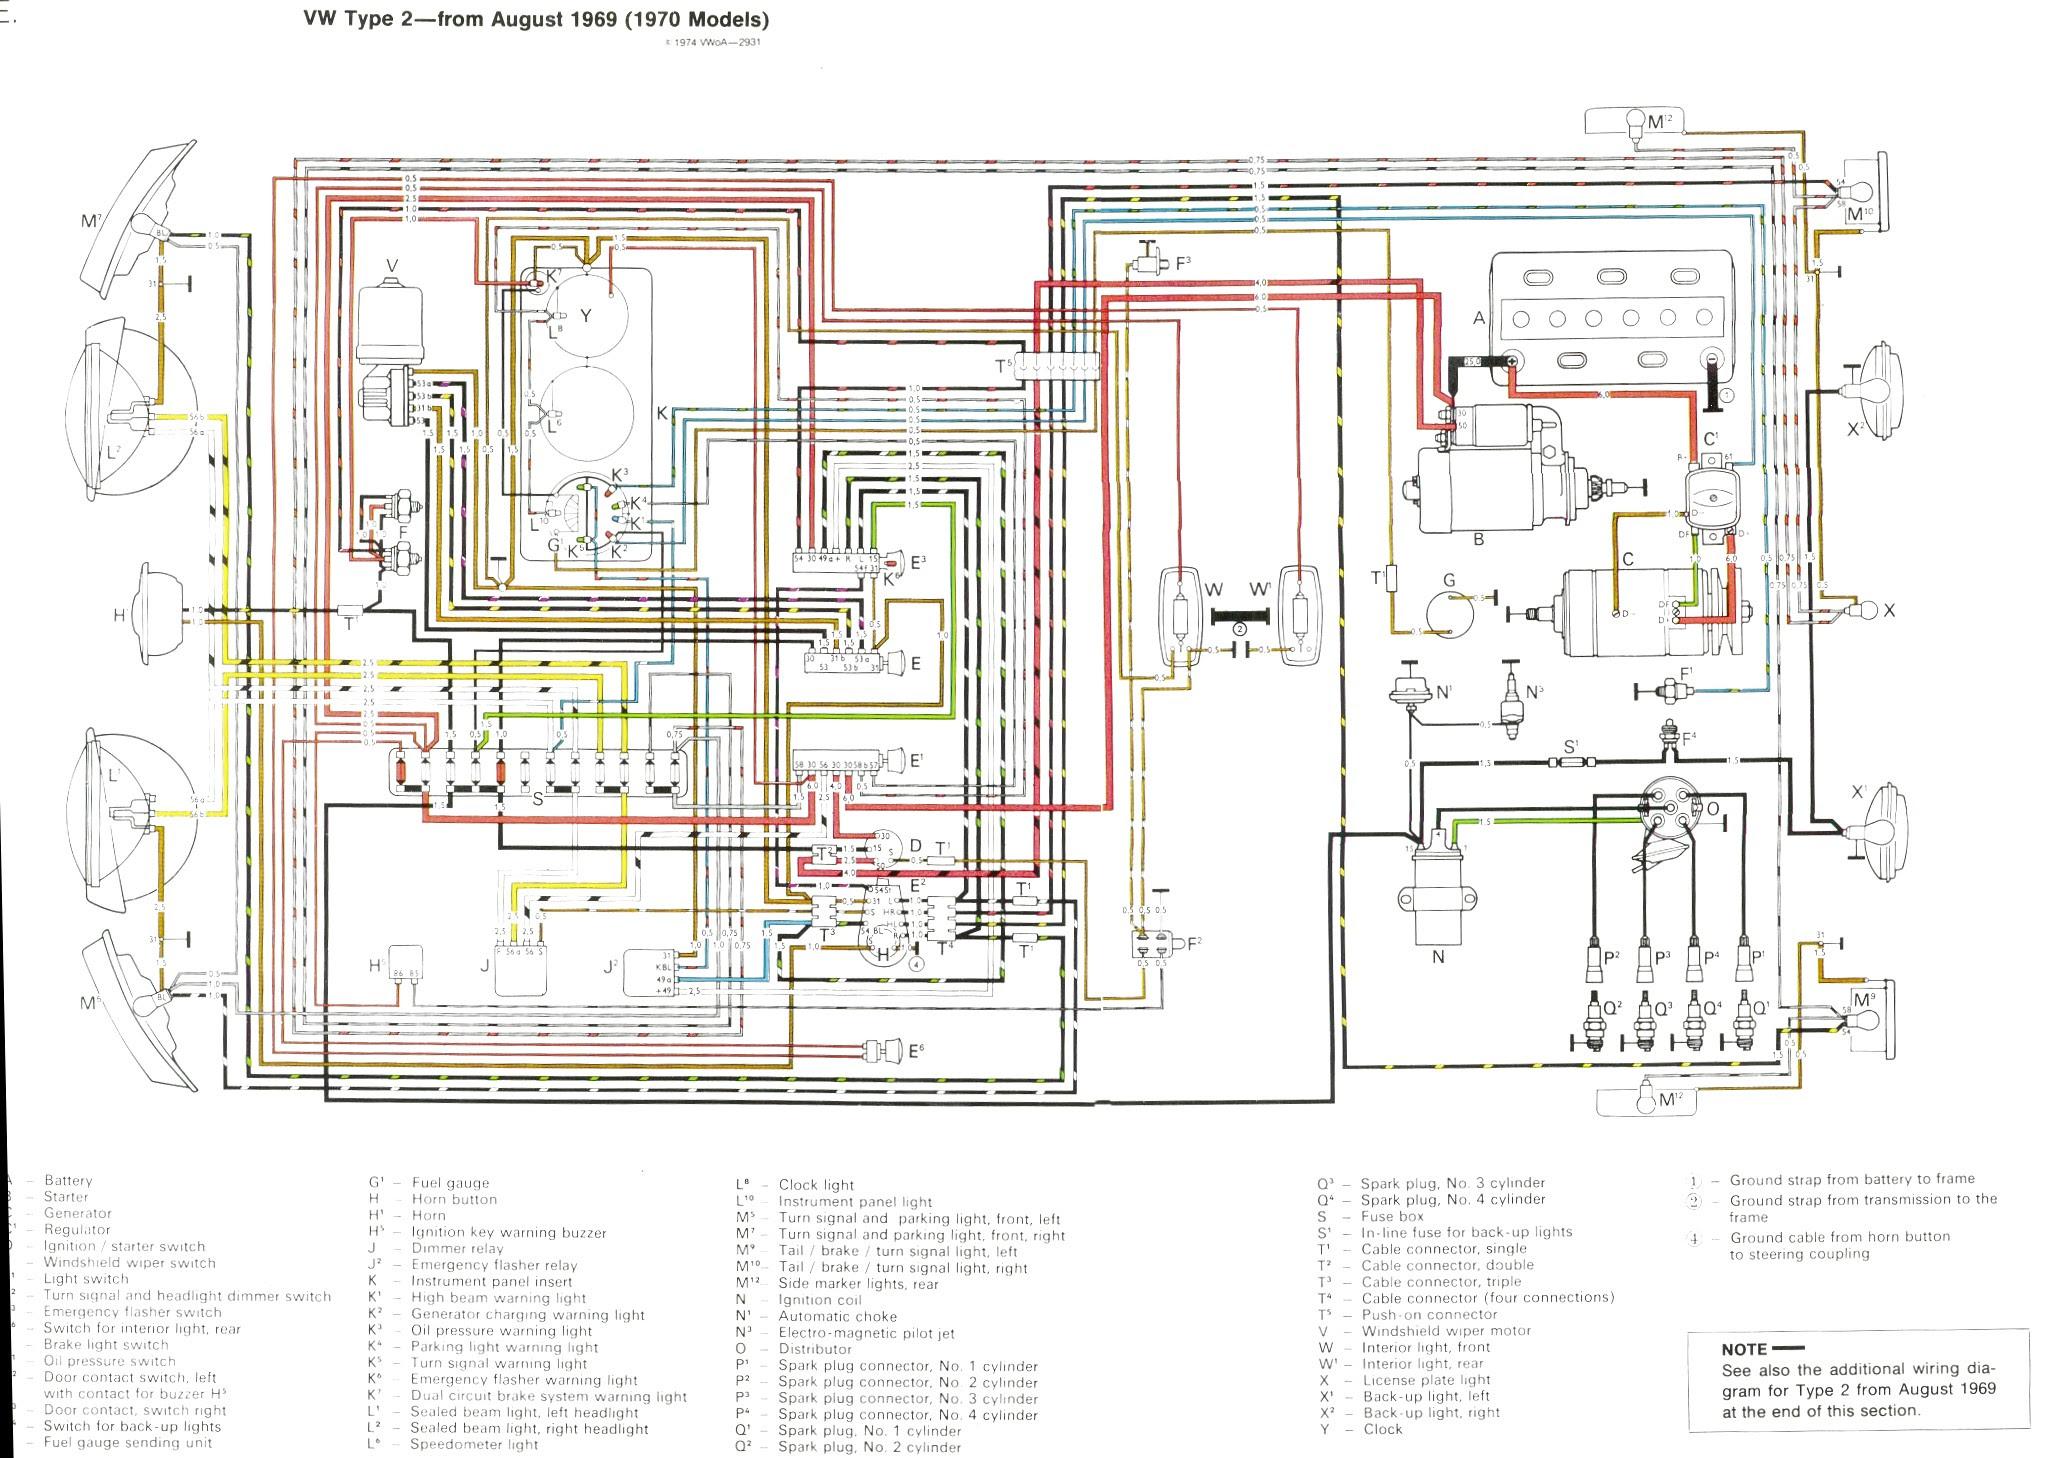 1974 Jeep Cj5 Wiring Diagram - Wiring Diagram